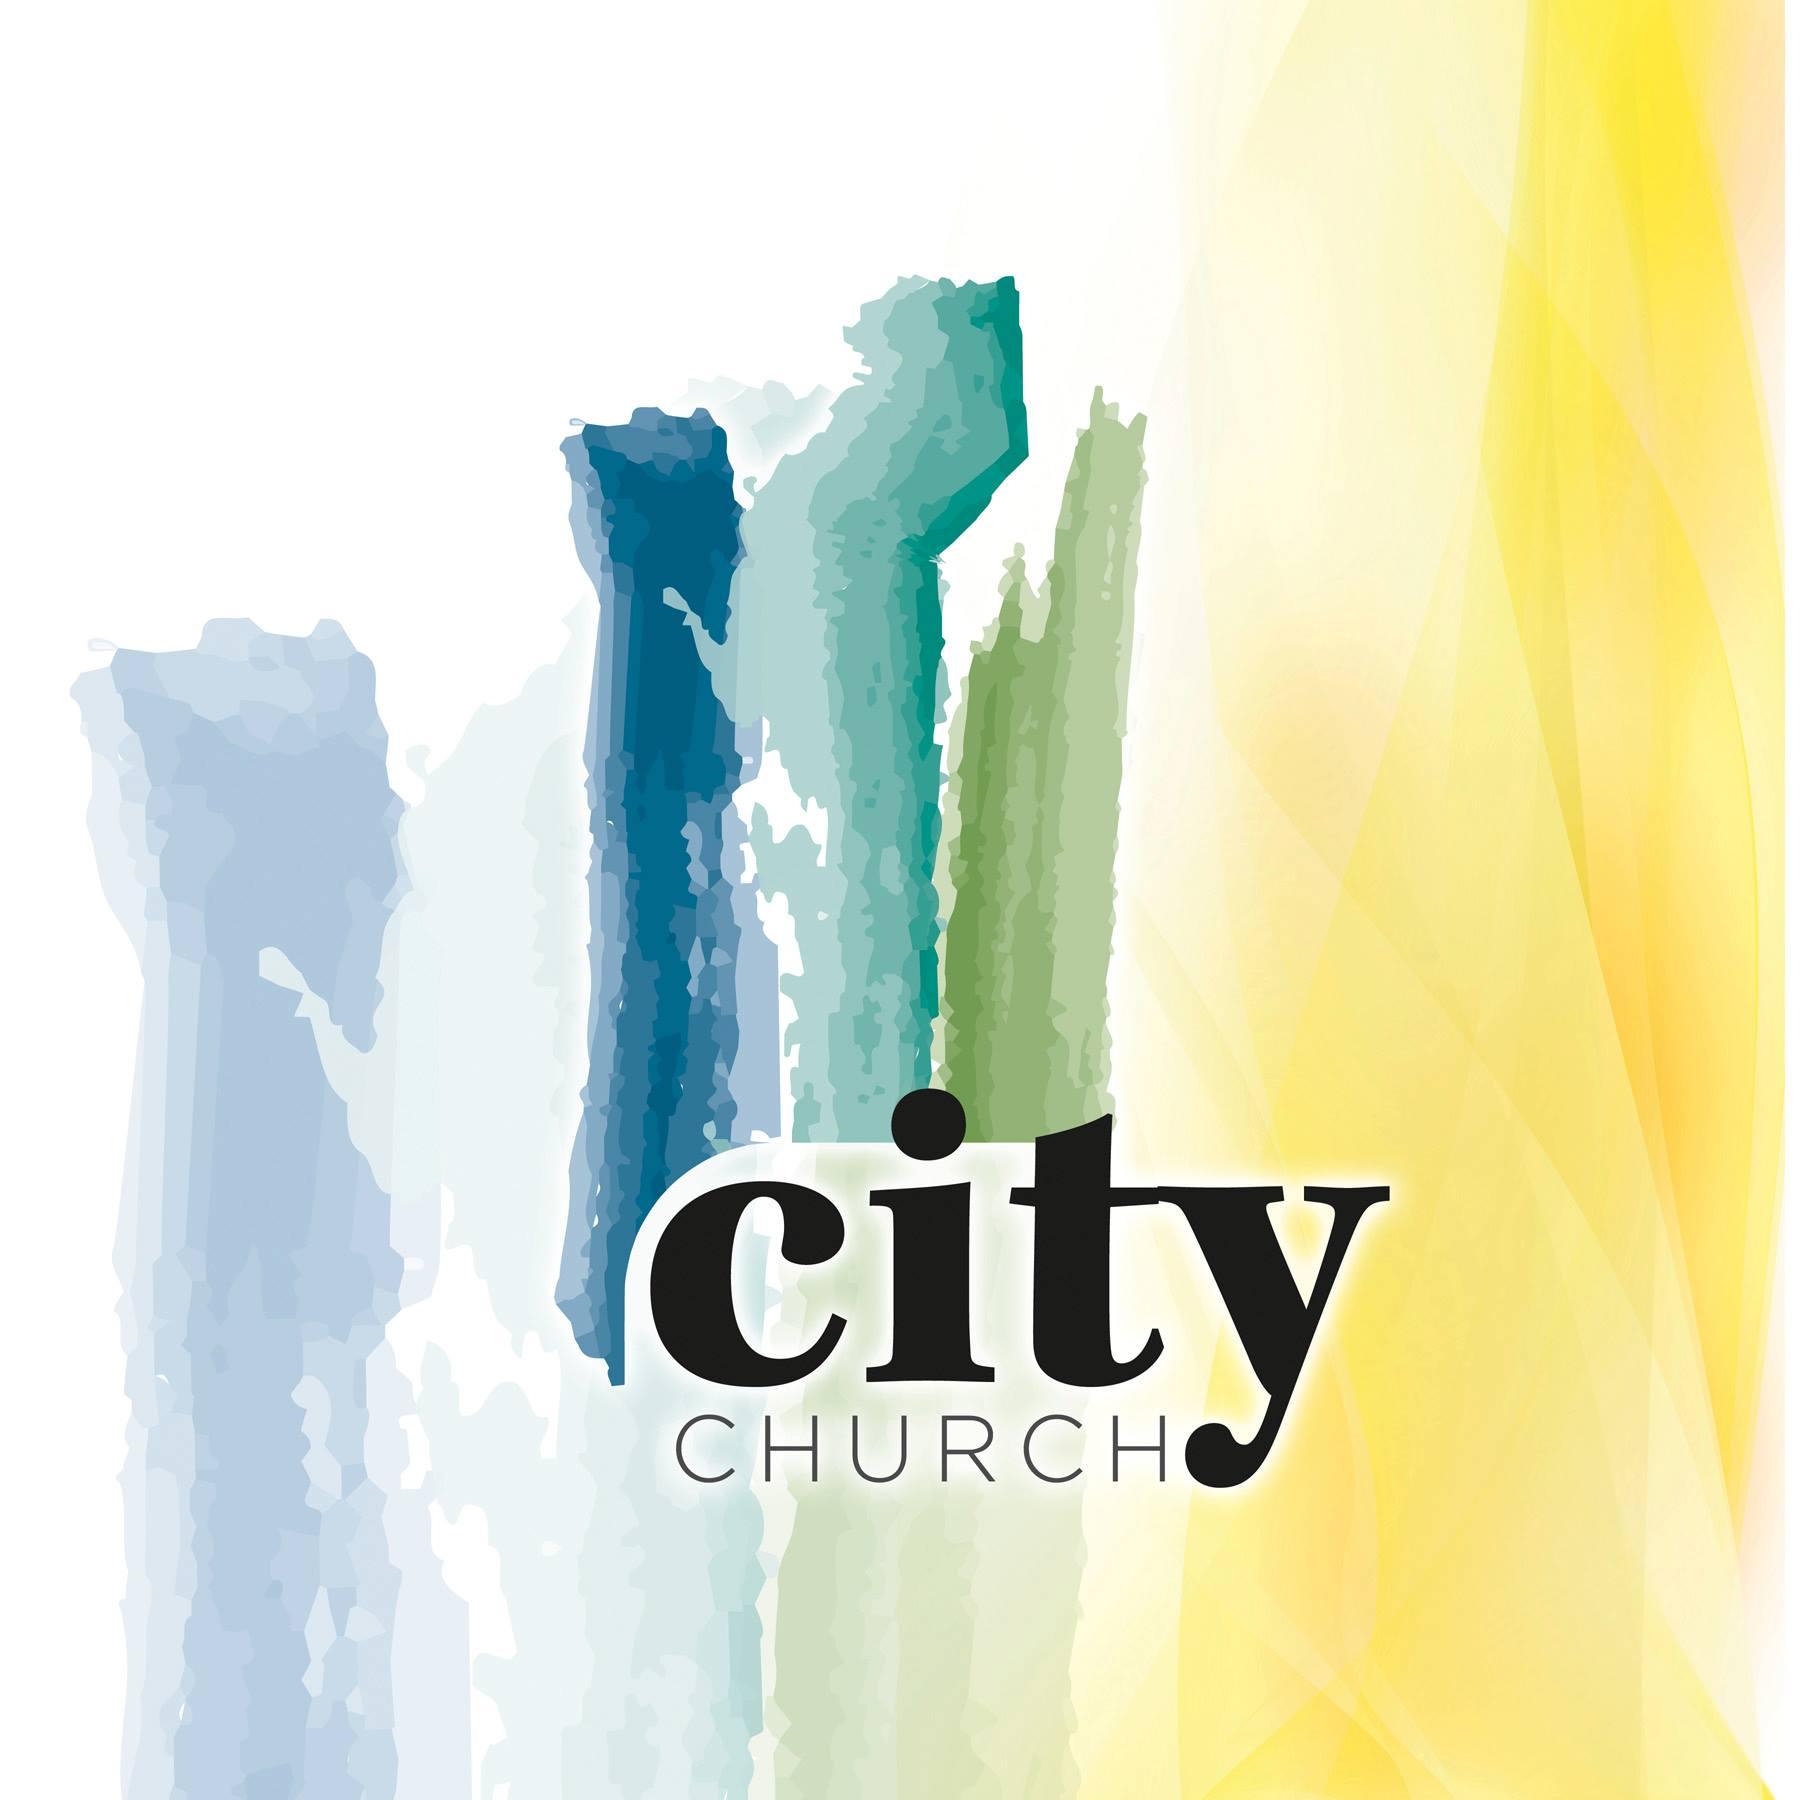 city church logo.jpg